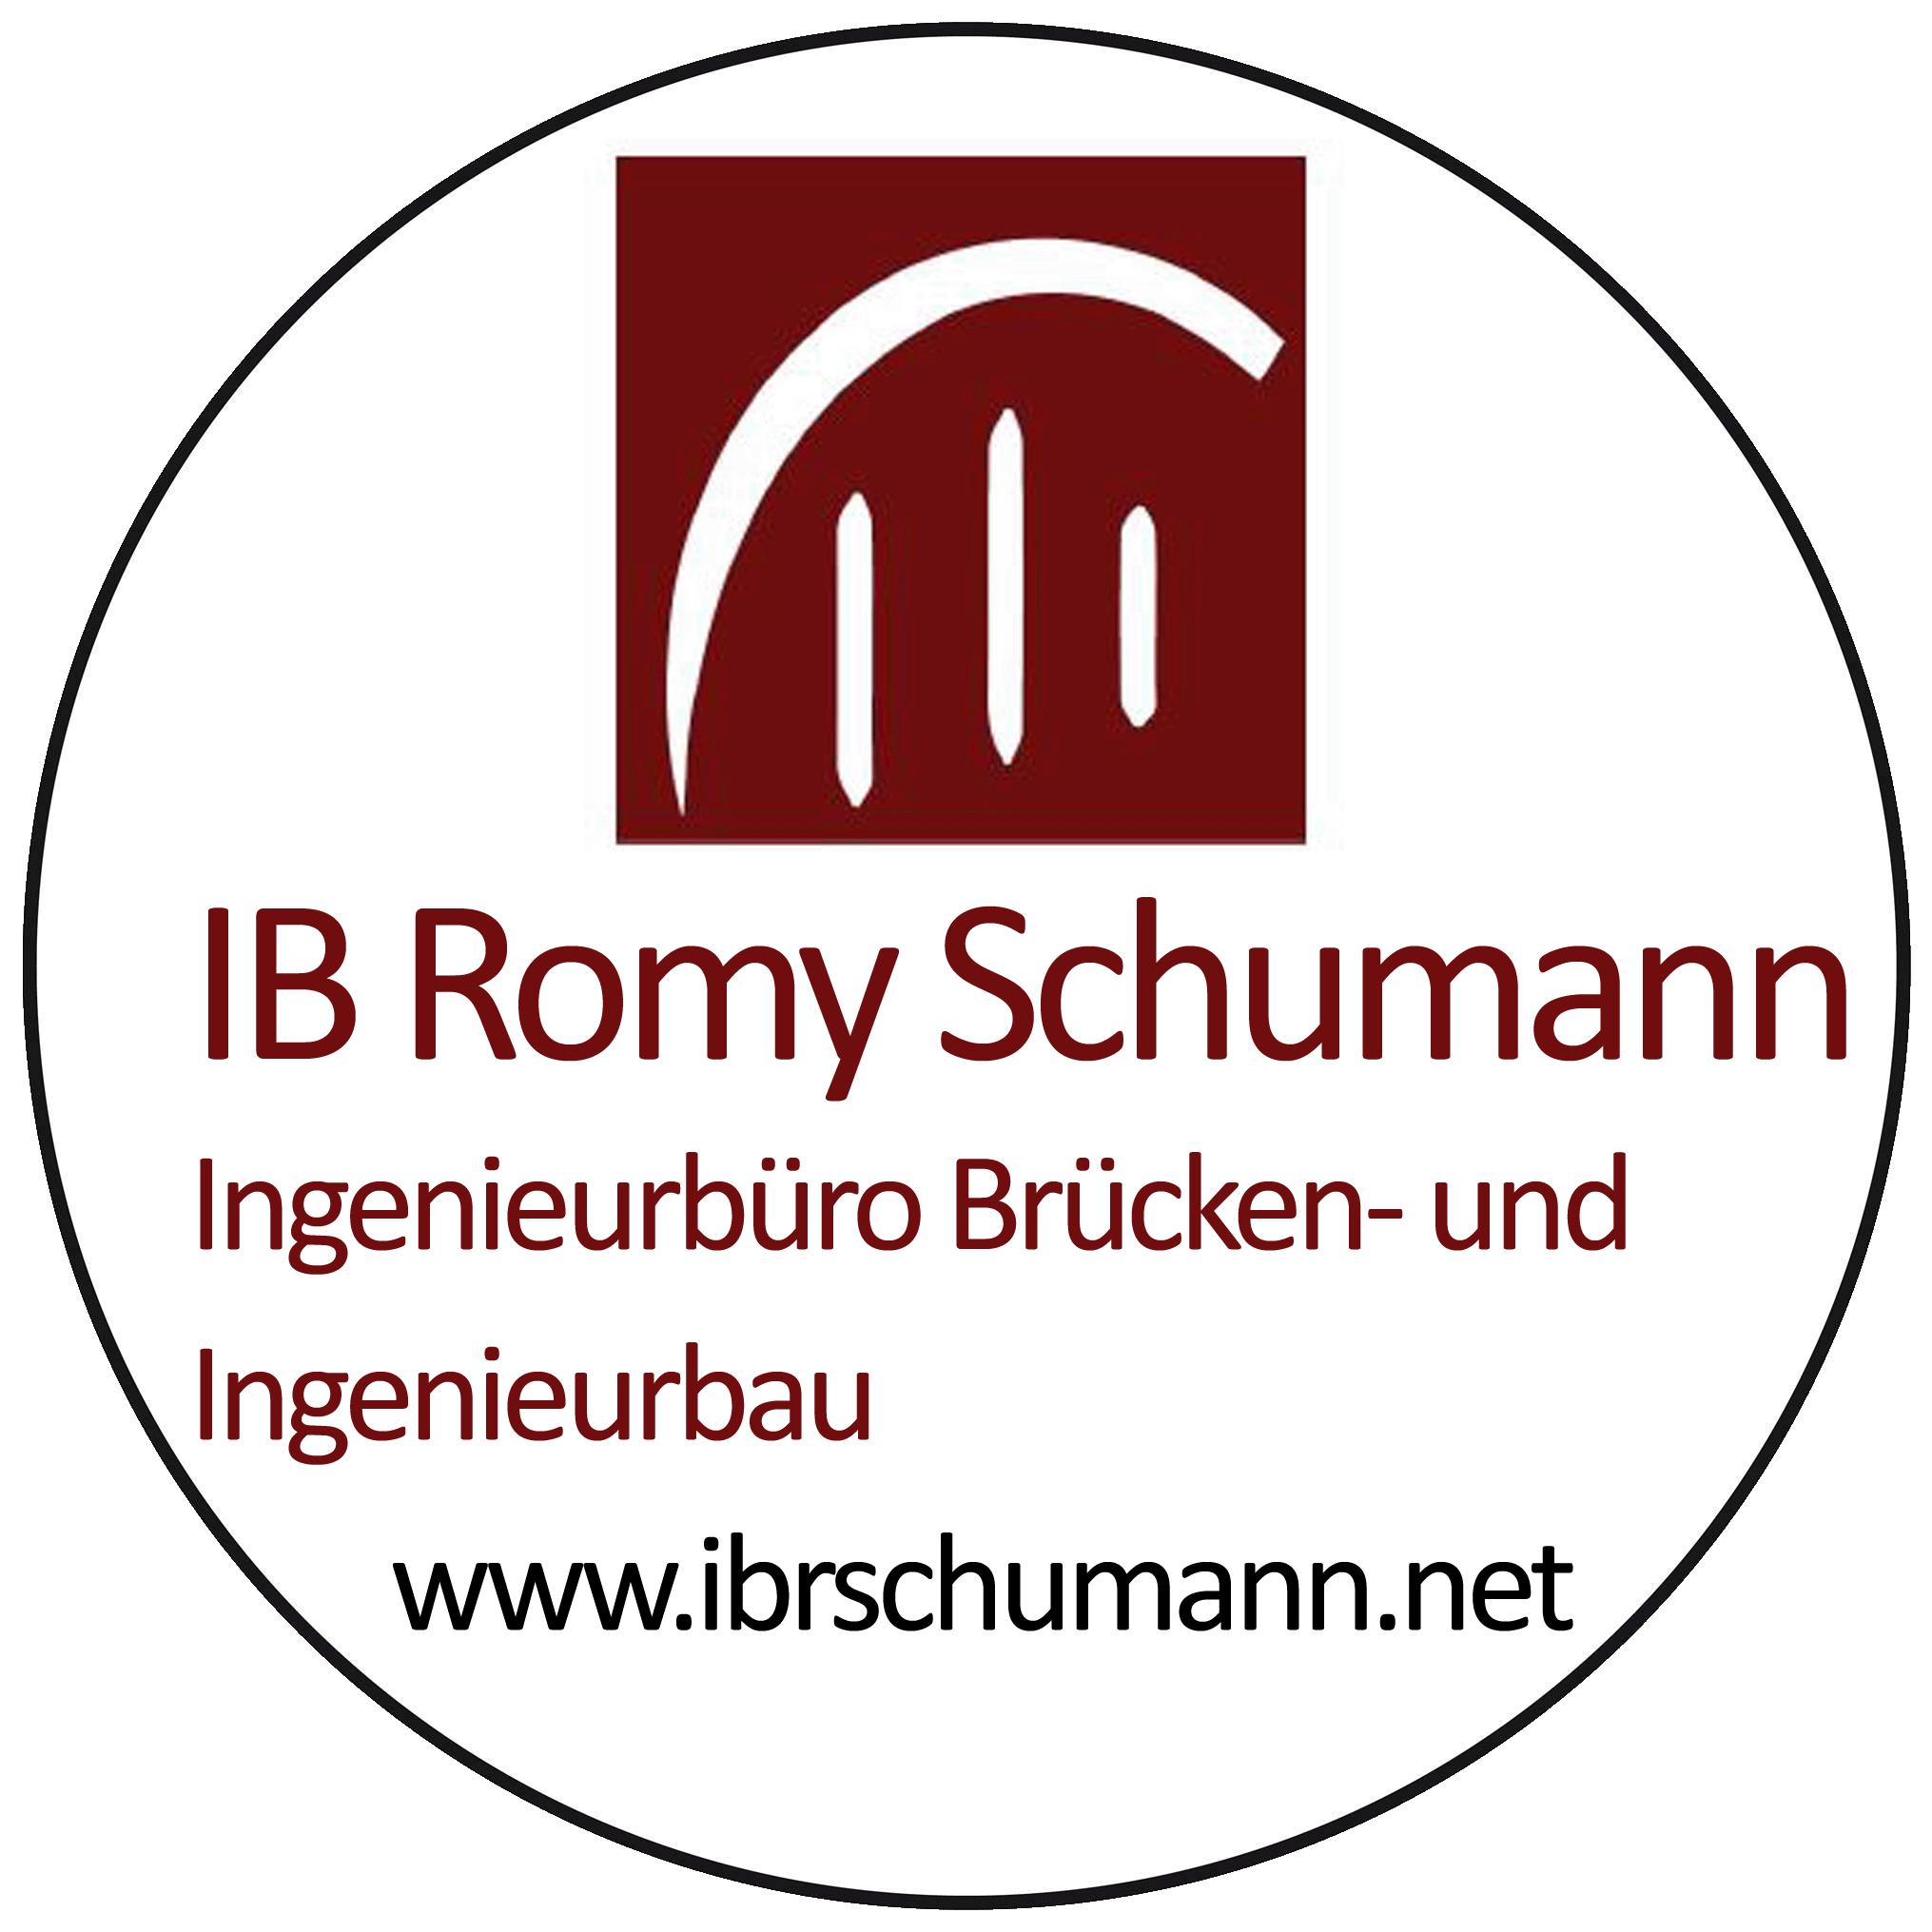 IB Romy Schumann - Ingenieurbüro Brücken- + Ingenieurbau